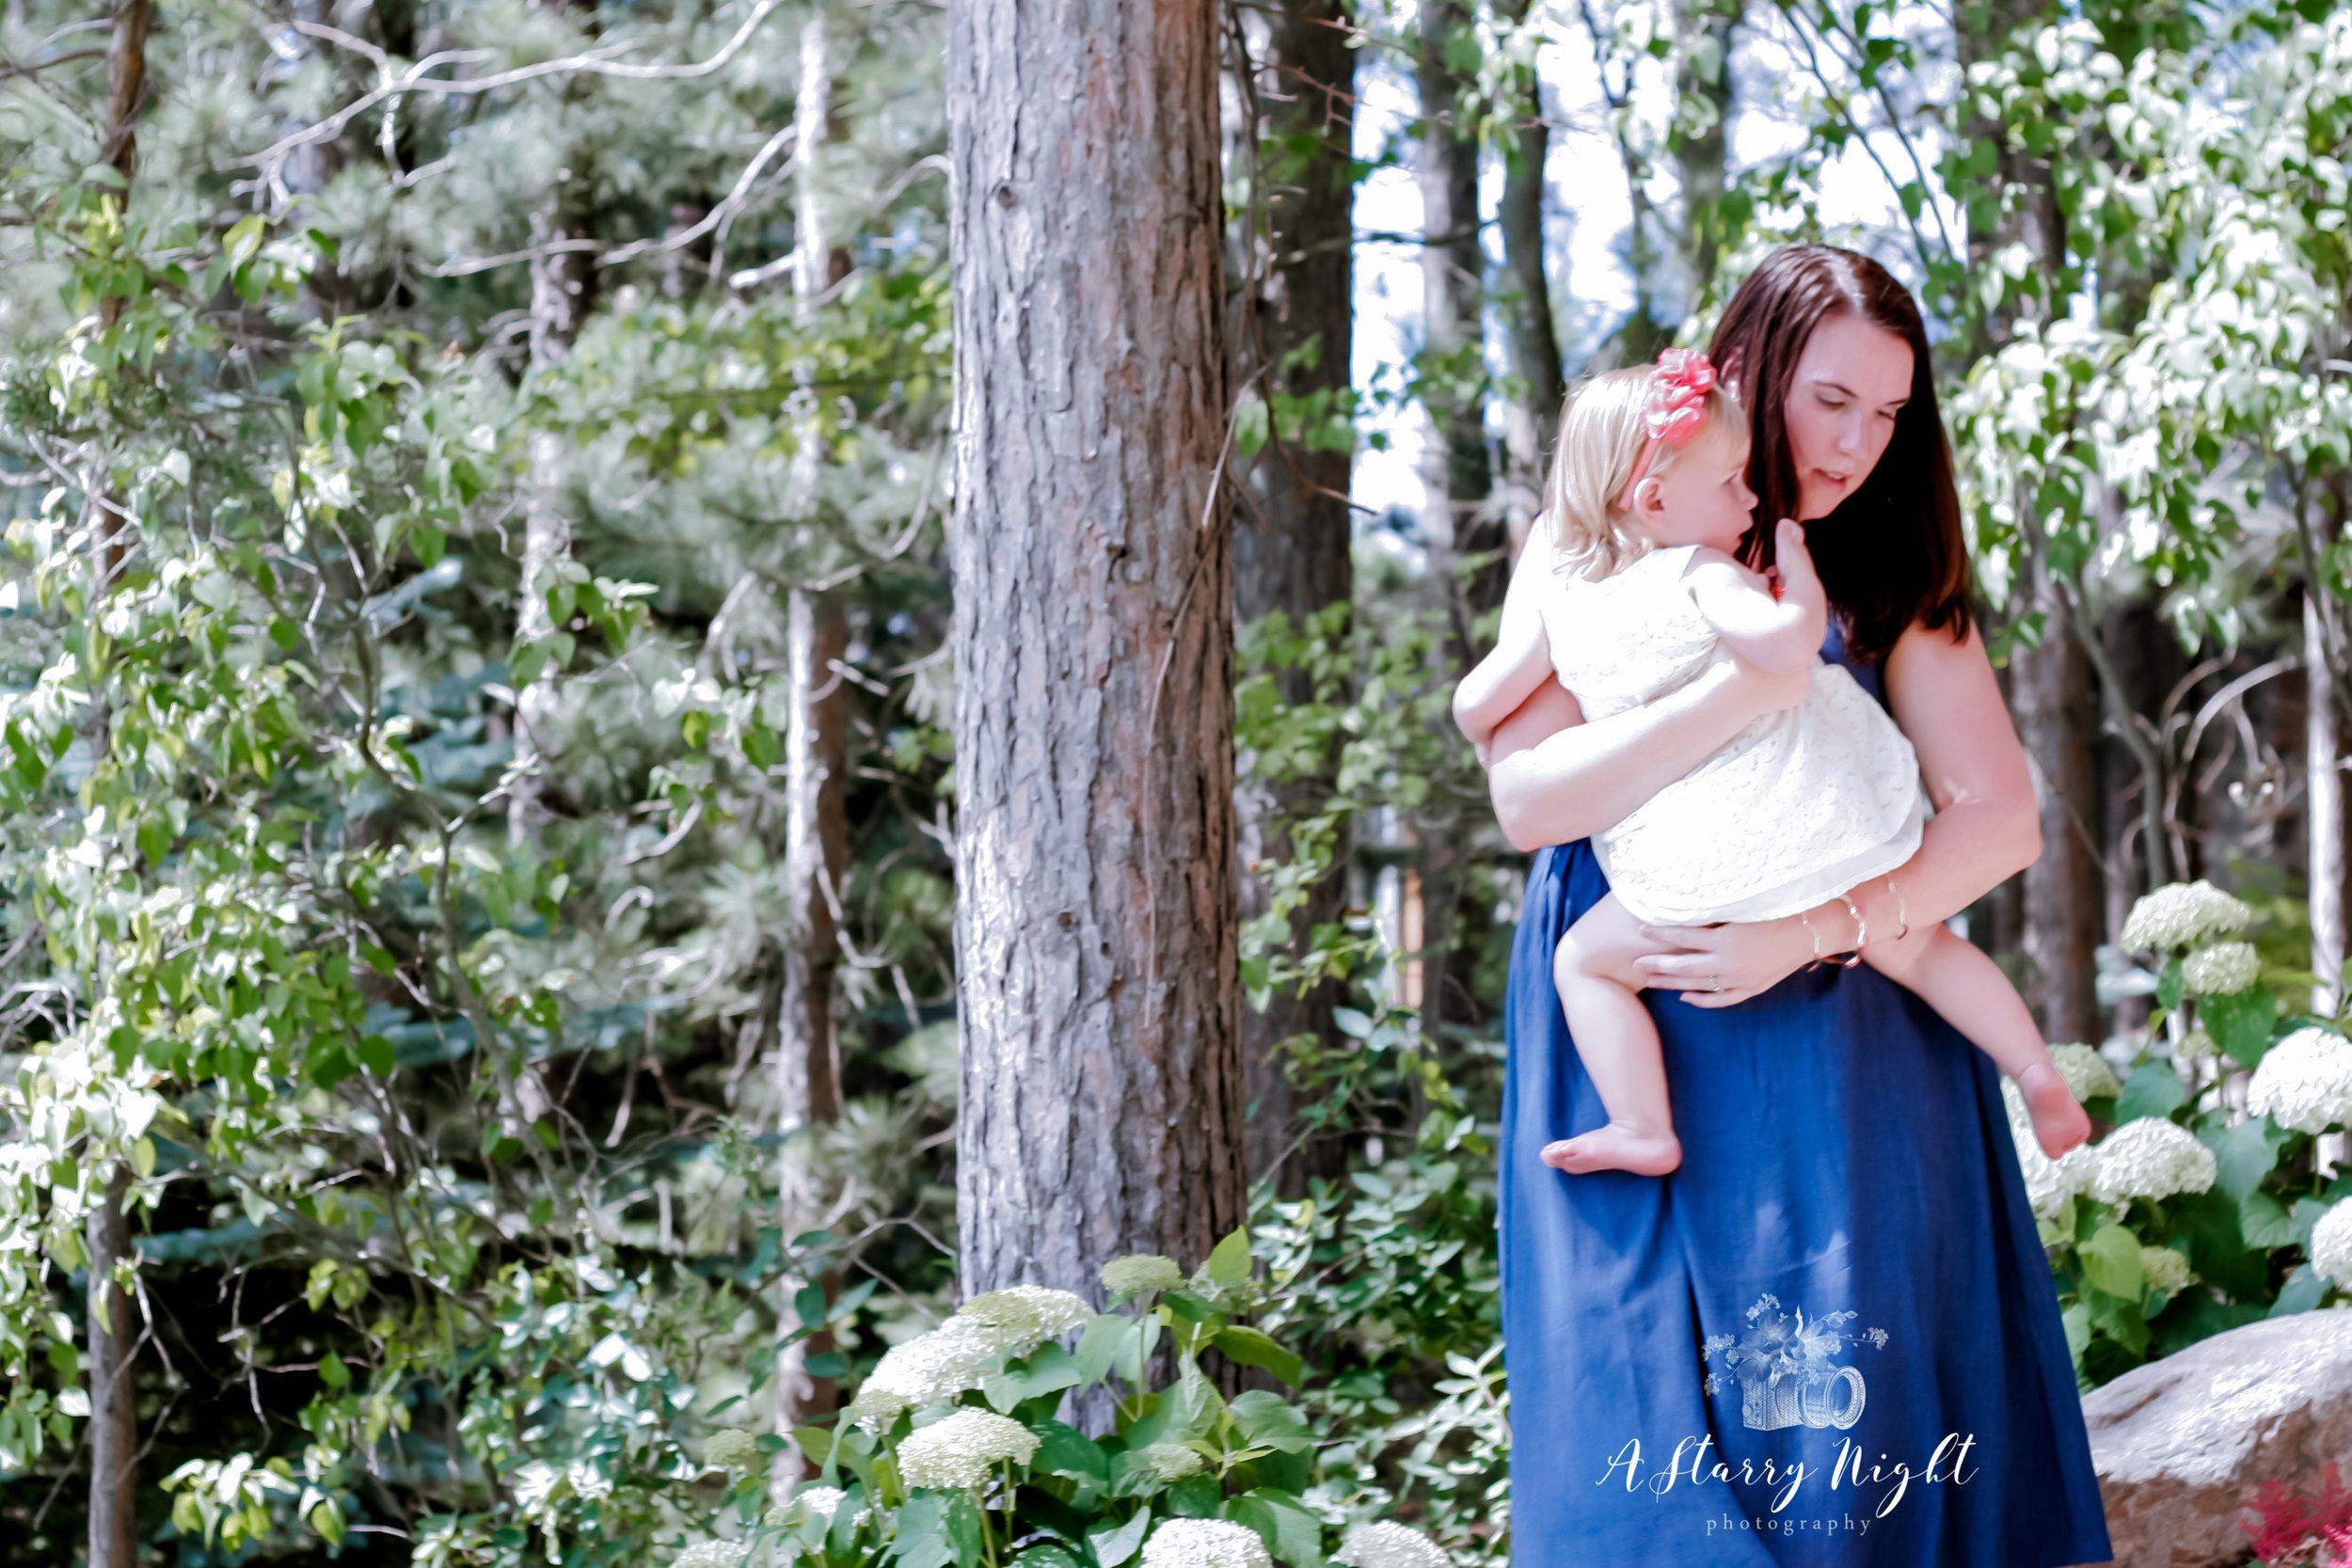 Thietten-Family-Lifestyle-Session-Farwell-Lake-13-10.jpg